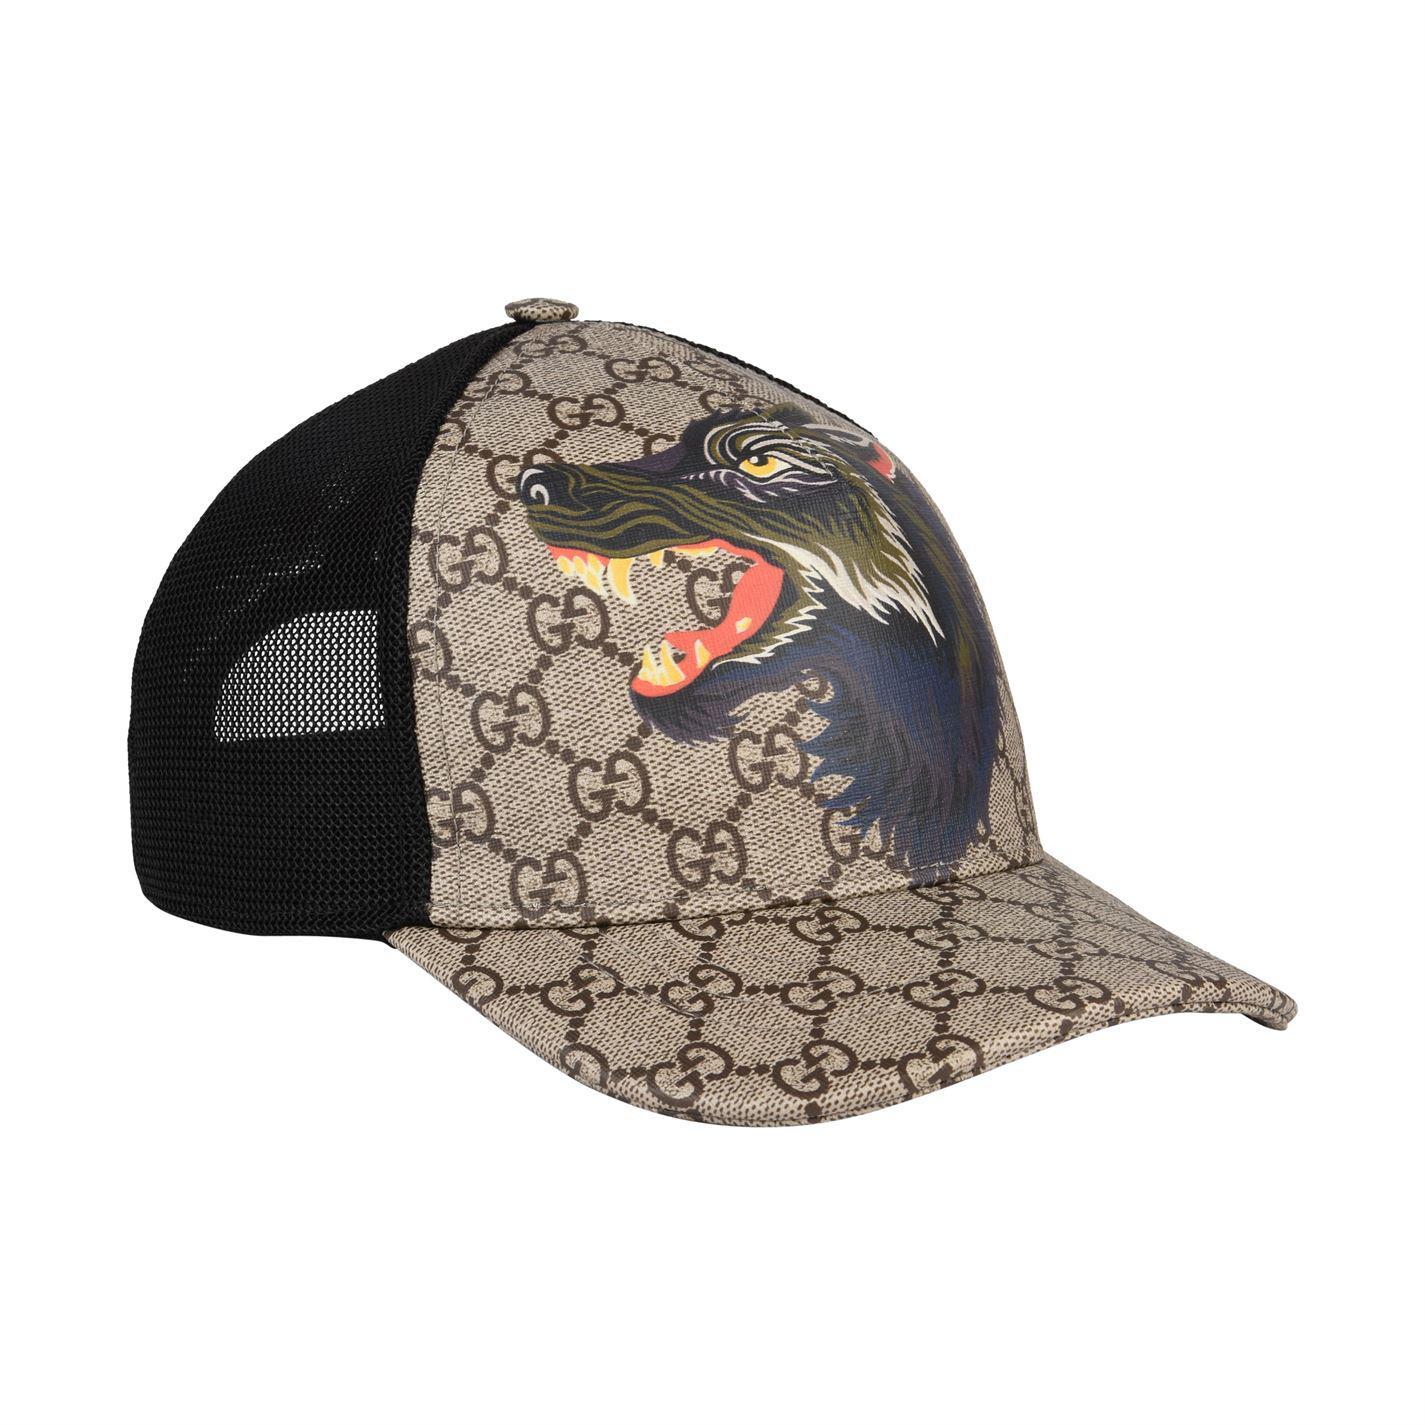 ... beauty b170a 93f45 Lyst - Gucci Gg Supreme Wolf Cap in Black for Men ... 25176df5909e